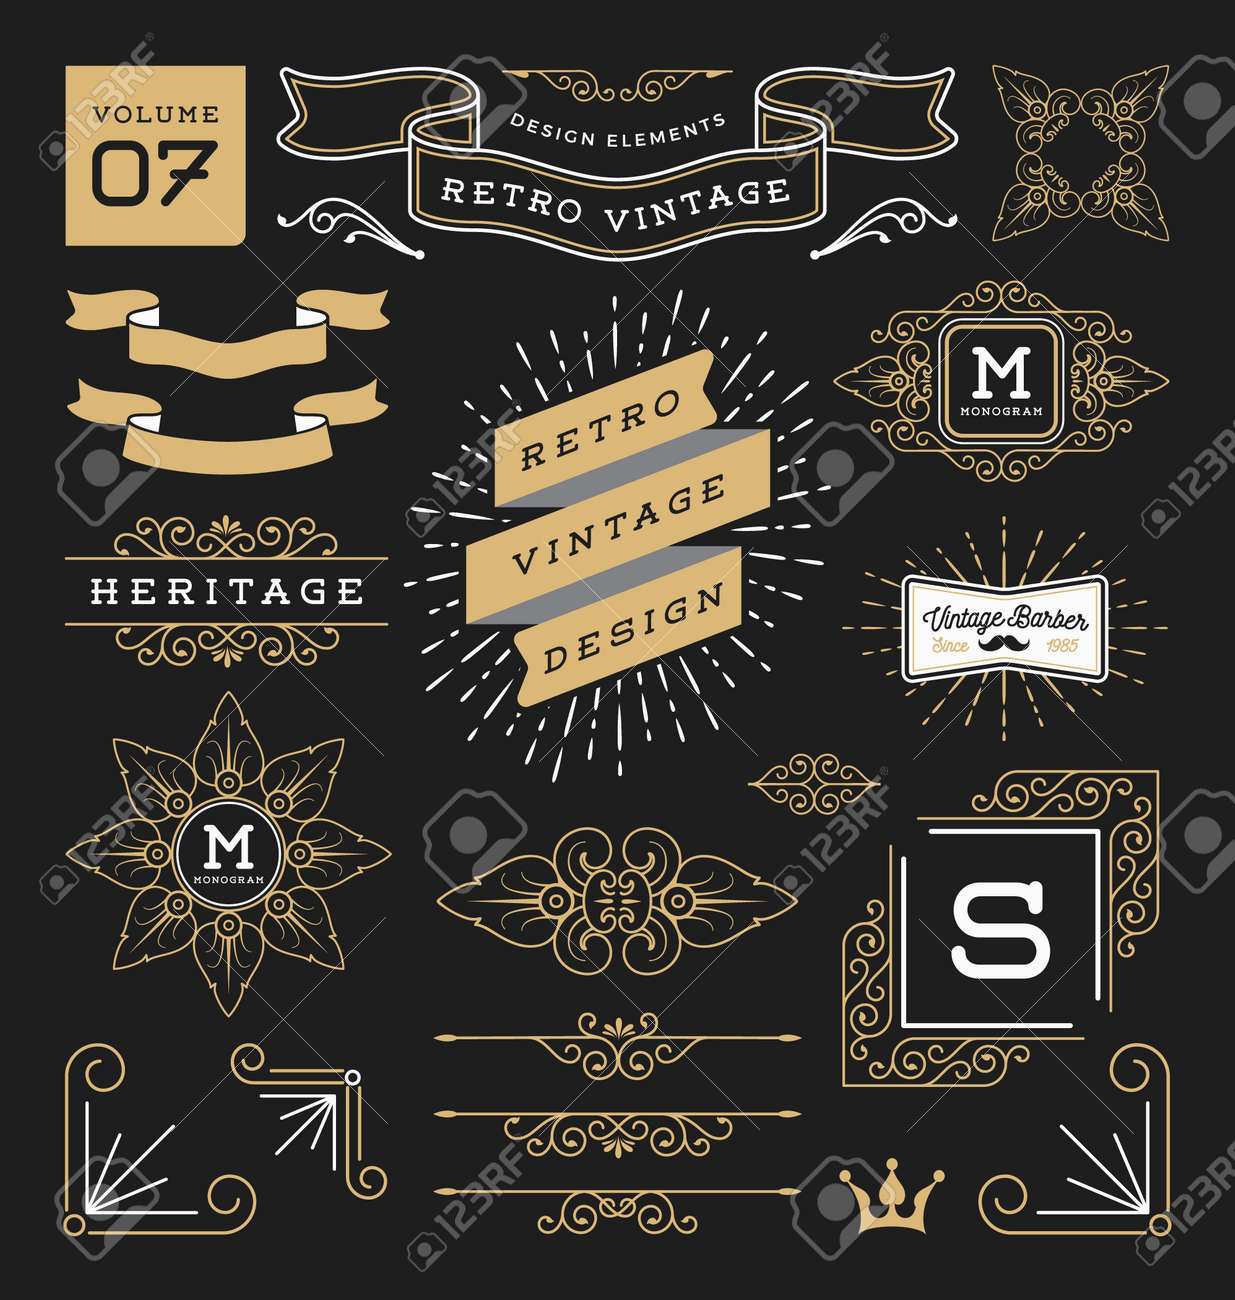 Set of retro vintage graphic design elements. Sign, frame labels, ribbons, symbols, crowns, corner, flourishes line and ornaments. - 52847866